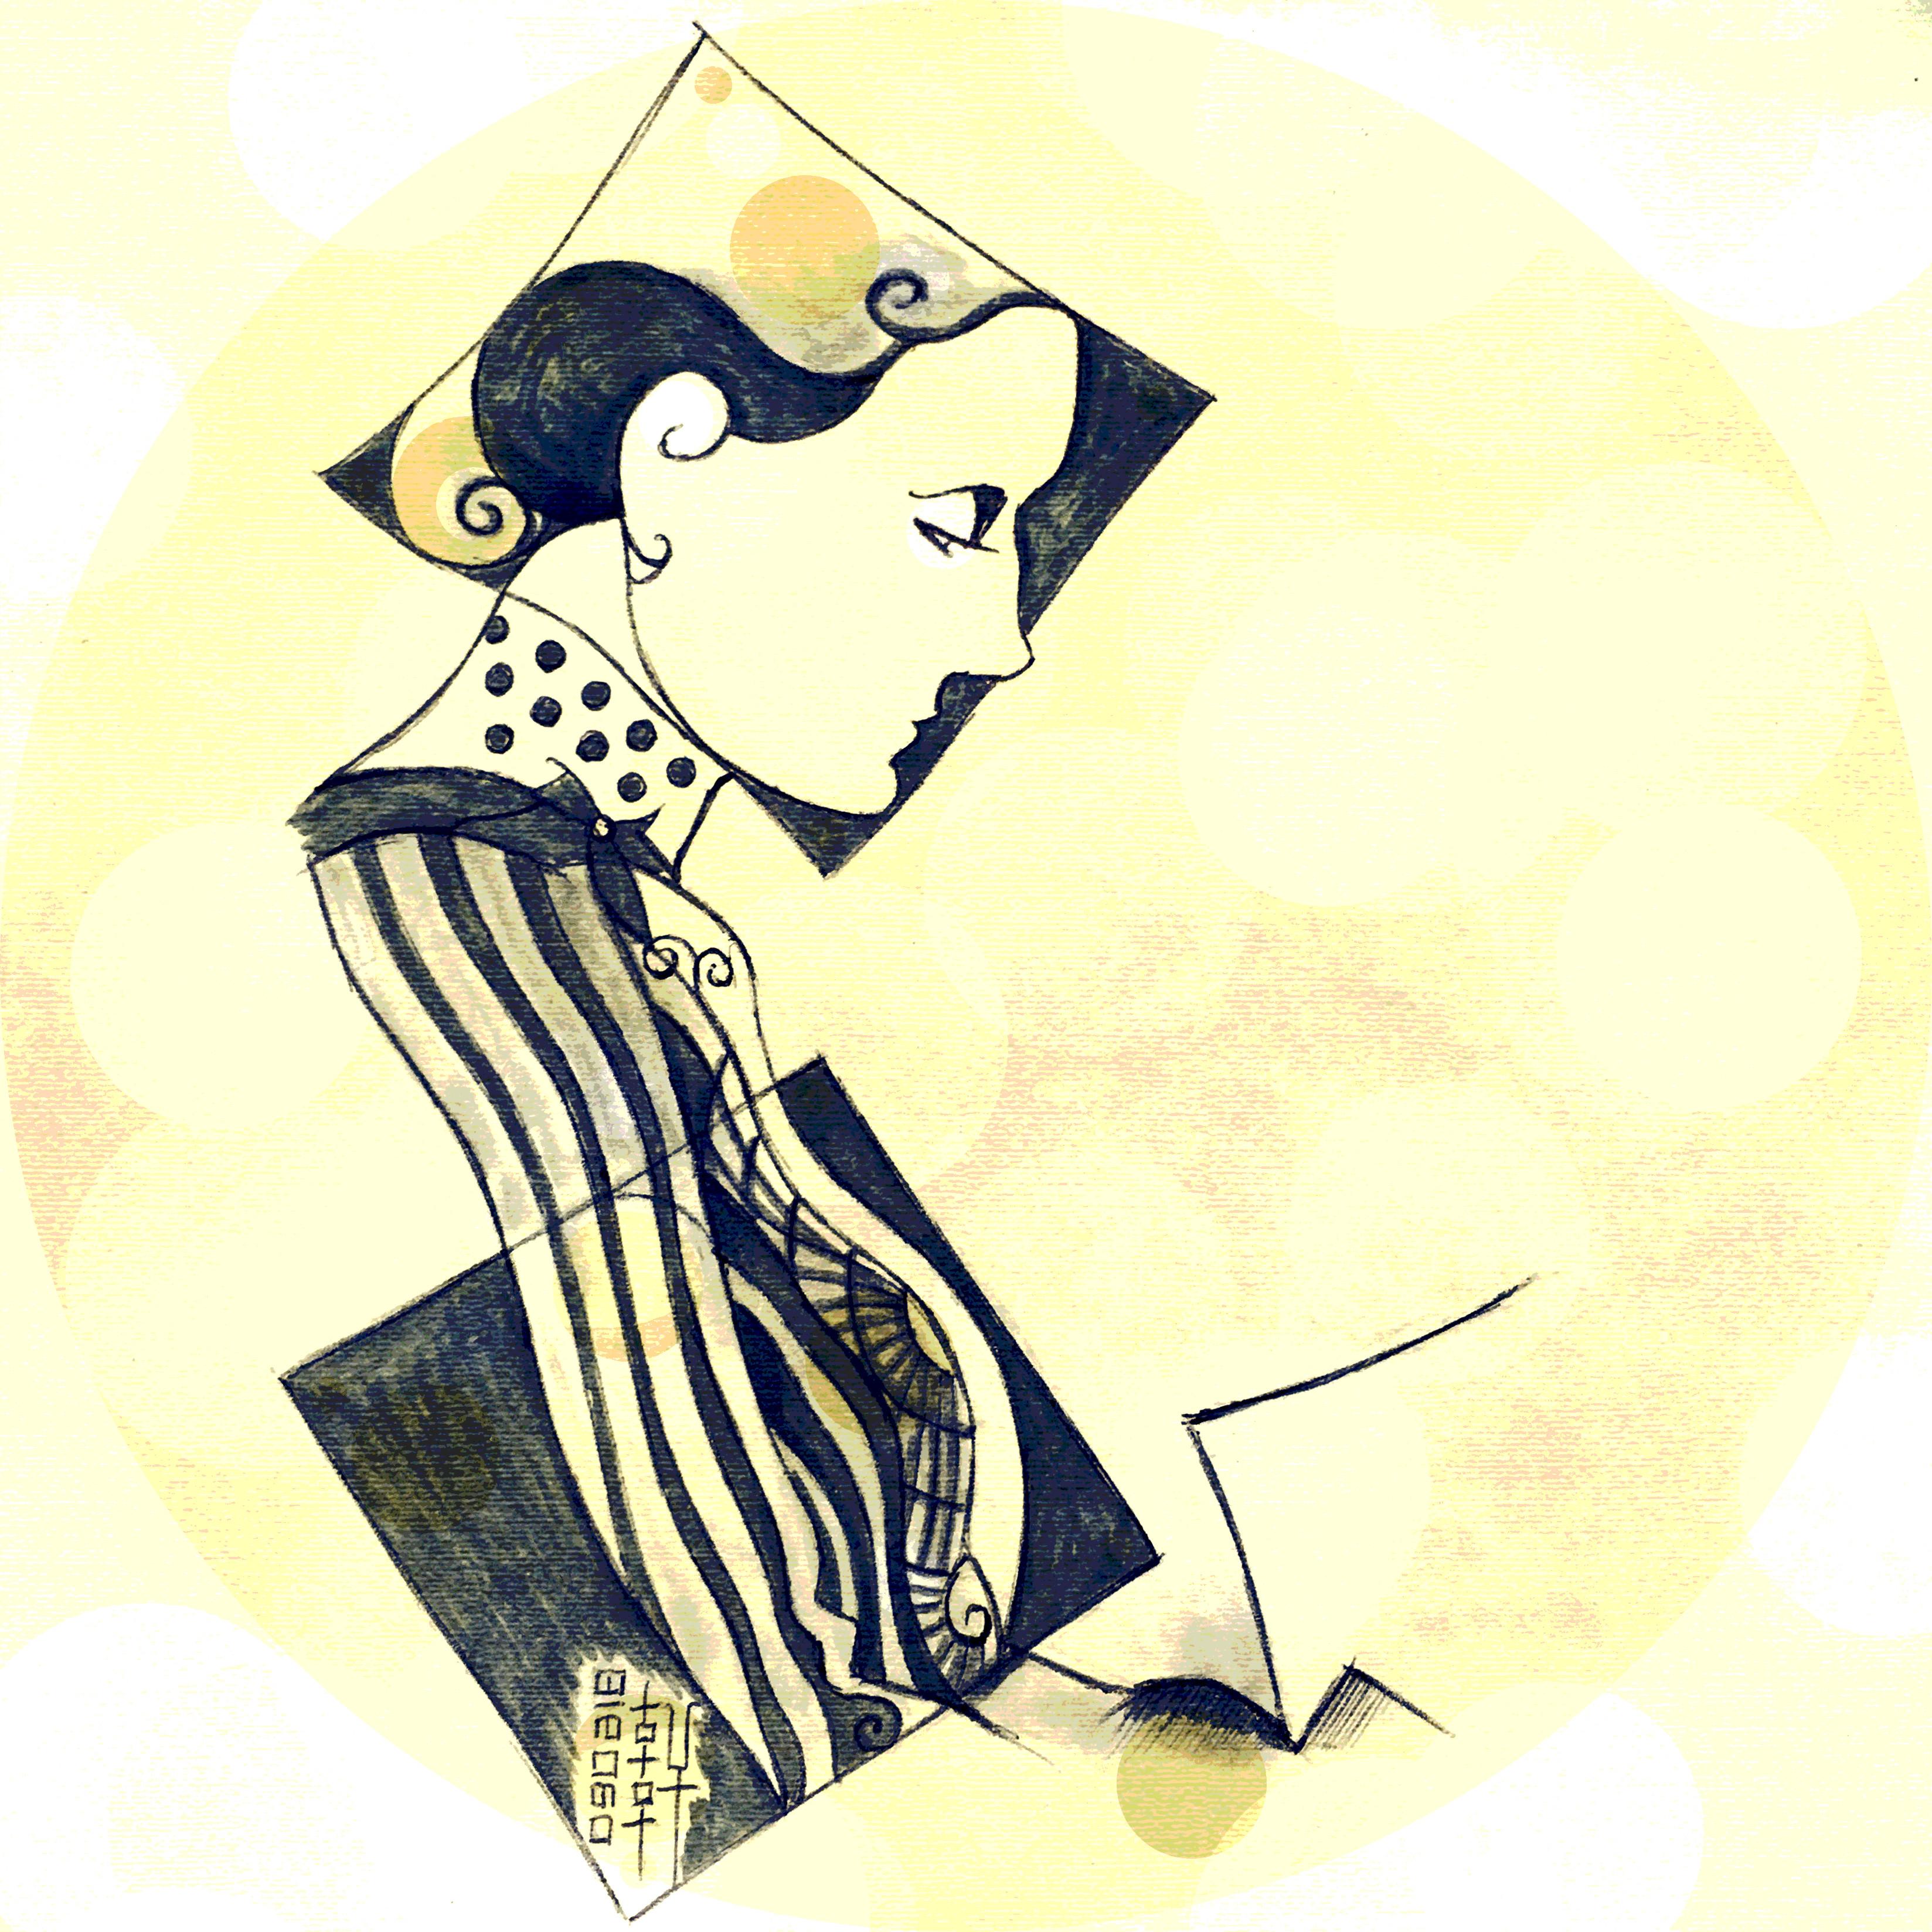 Day 09-06-18 - Jane Addams